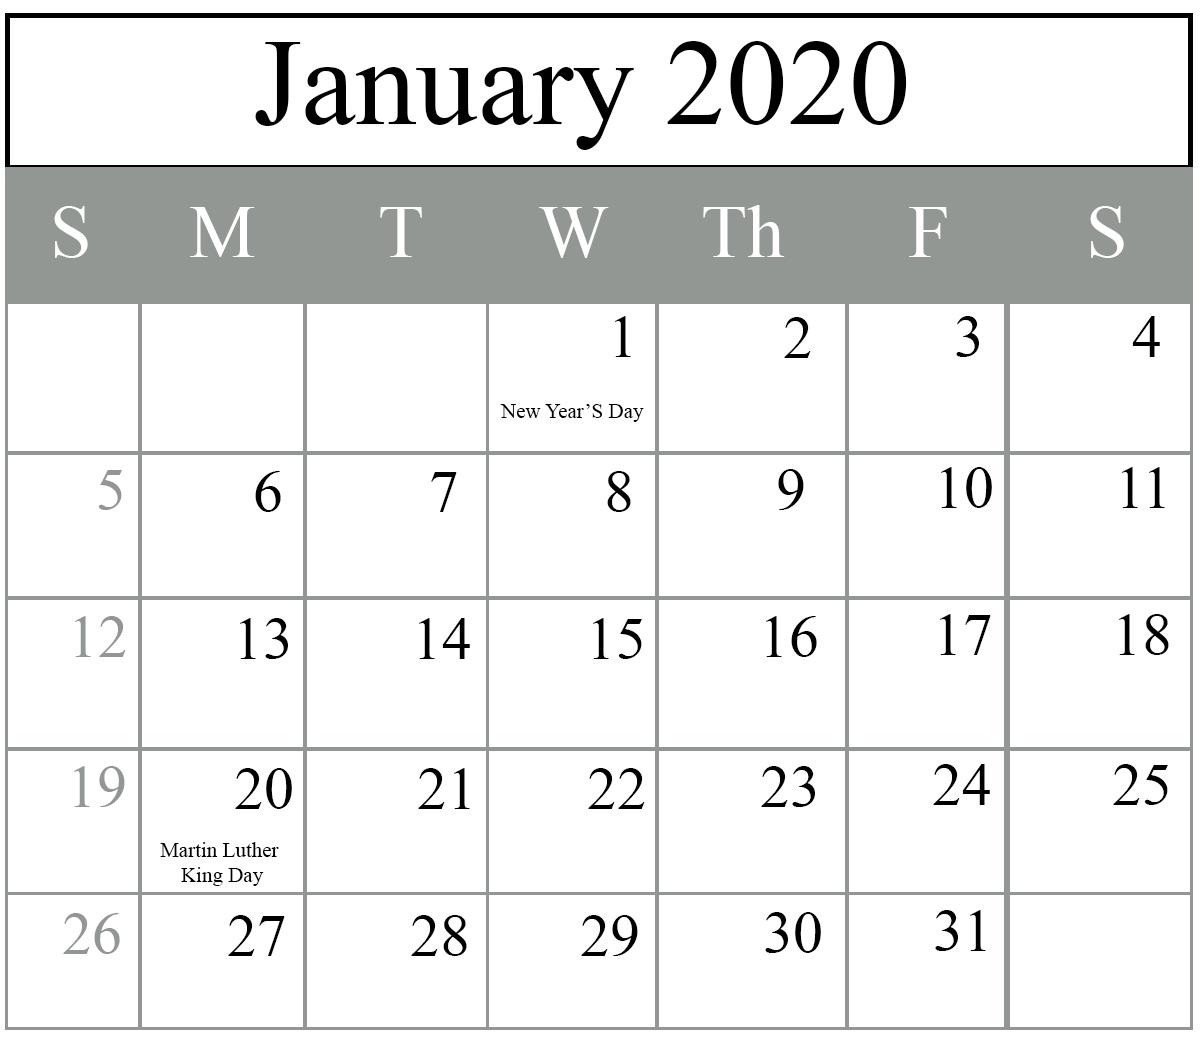 2020 January Calendar With Holidays